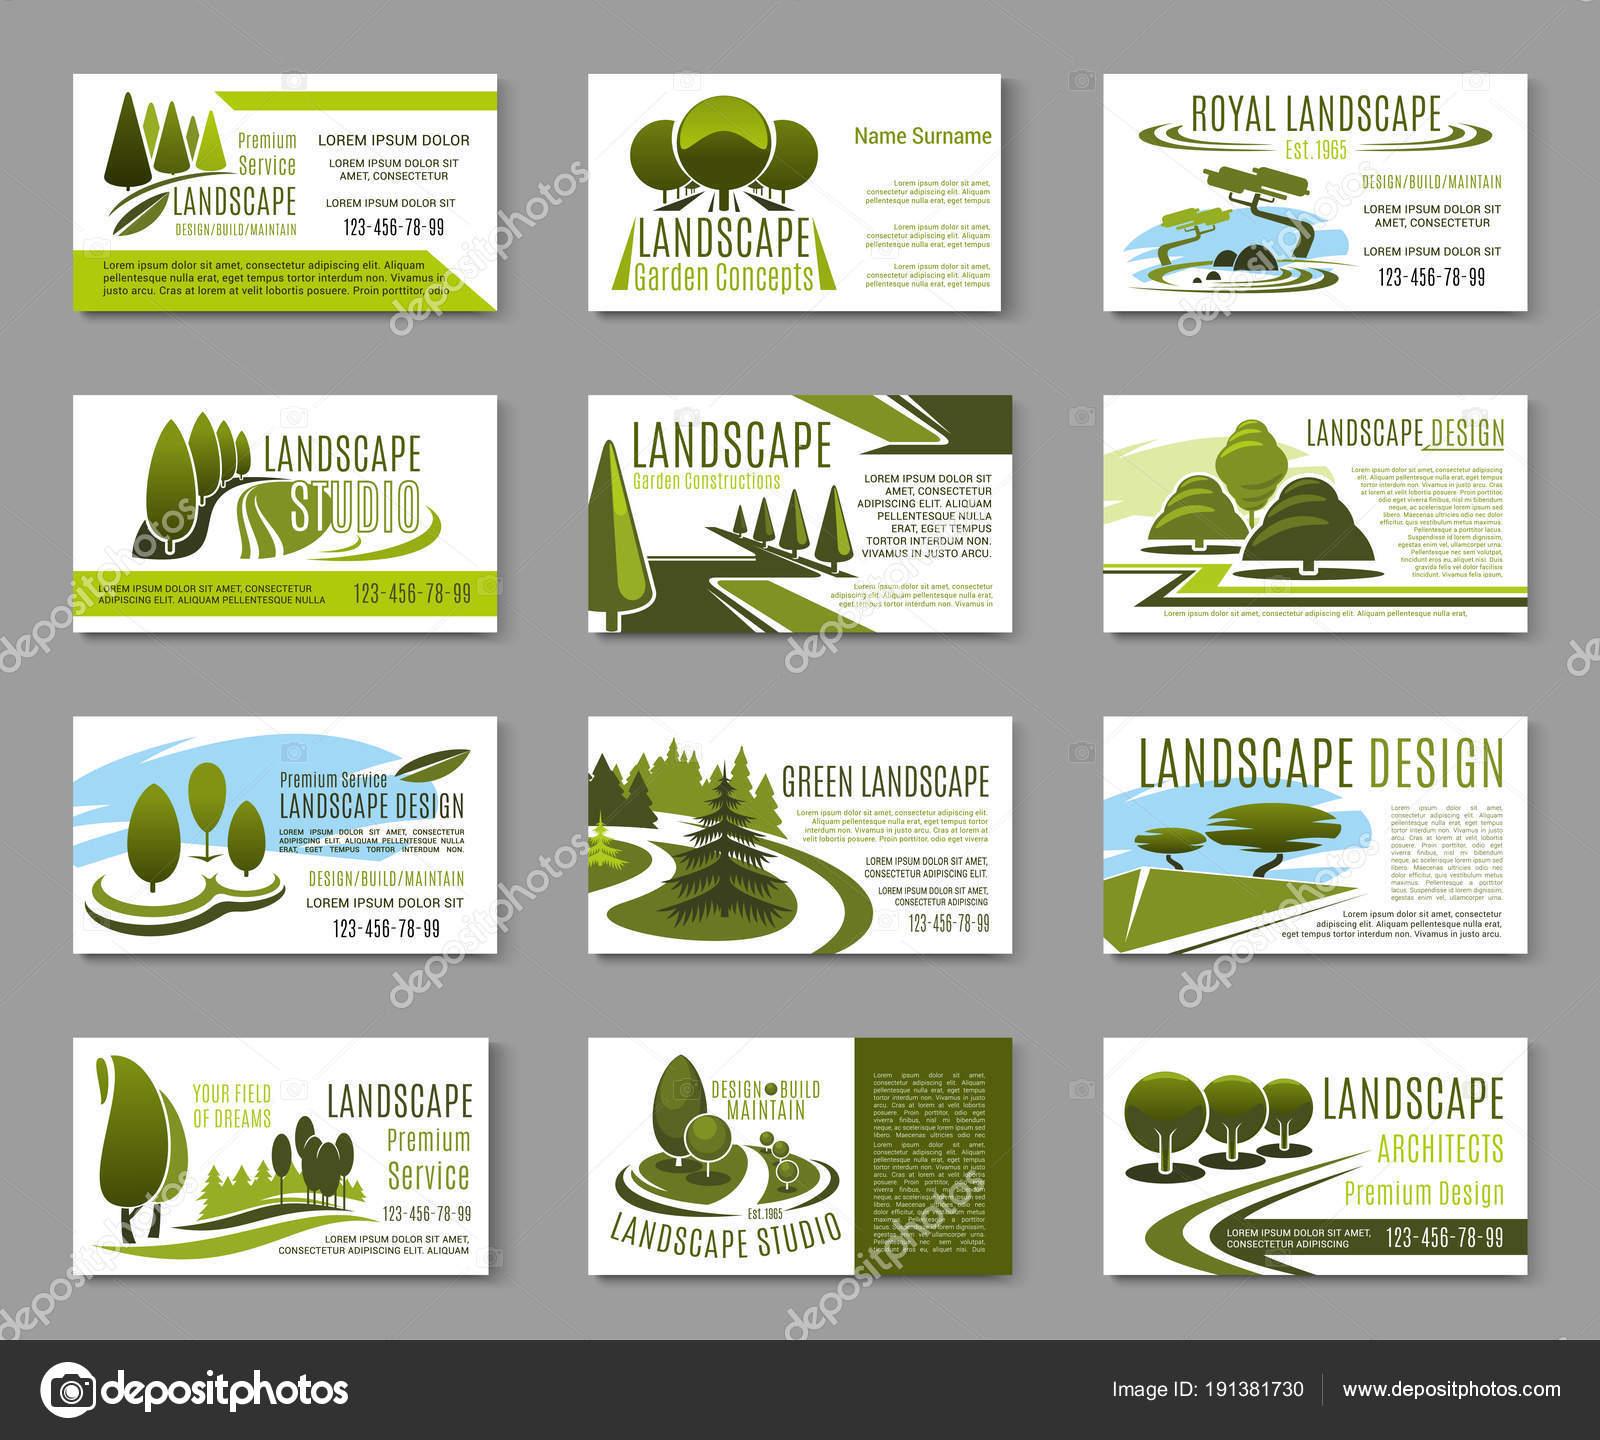 Landscape Design Business Cards   Landscape Design Studio With Gardening Business Cards Templates